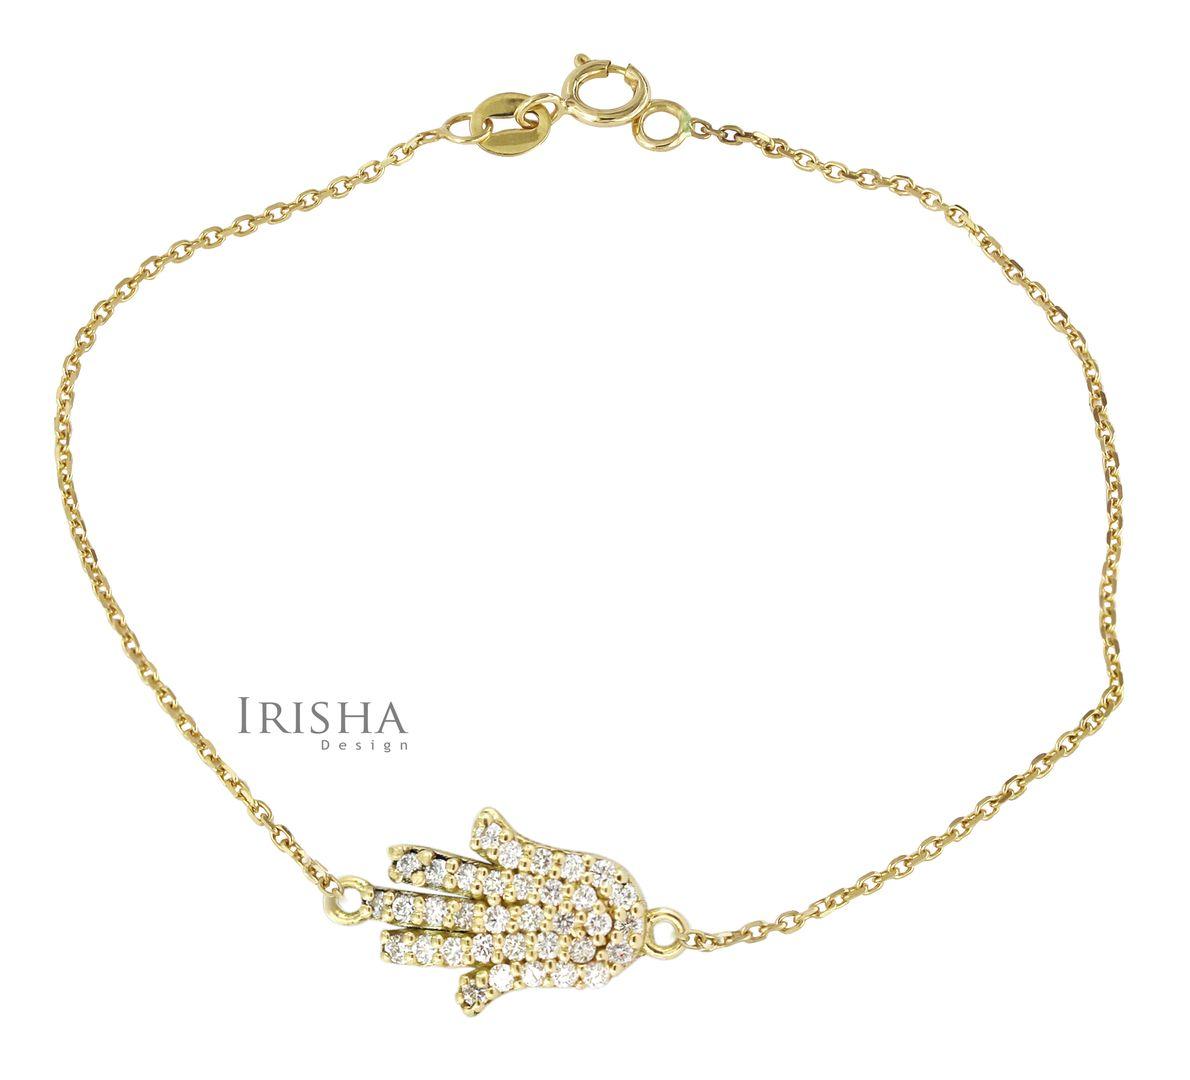 0.16 Ct. Genuine Diamond Hamsa Hand Charm Bracelet Fine Jewelry 14K Gold